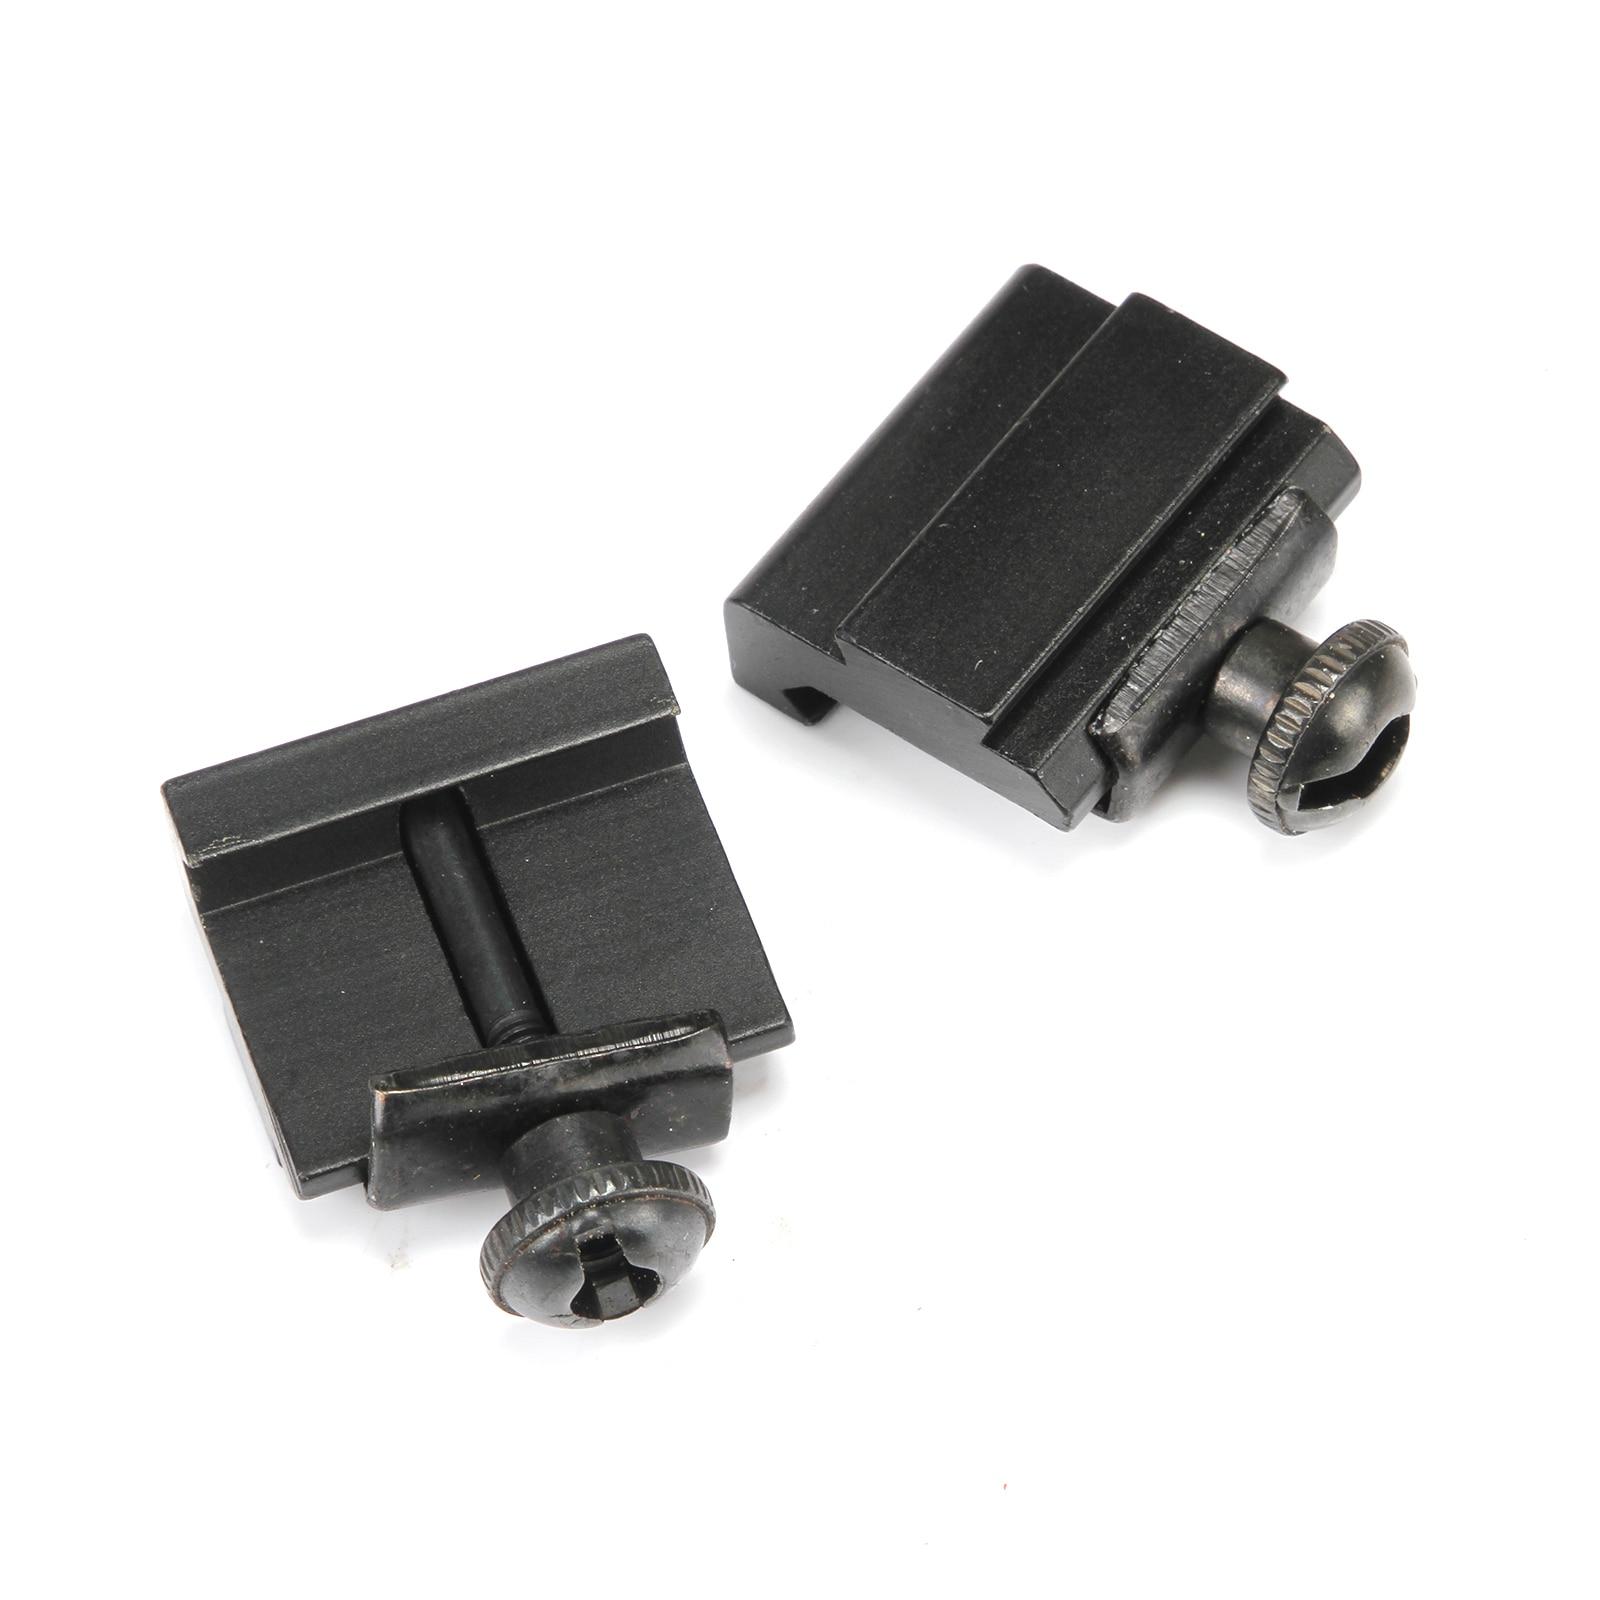 2 PCS 11mm - 20mm heightening rails extension brackets outdoor tactical bracket